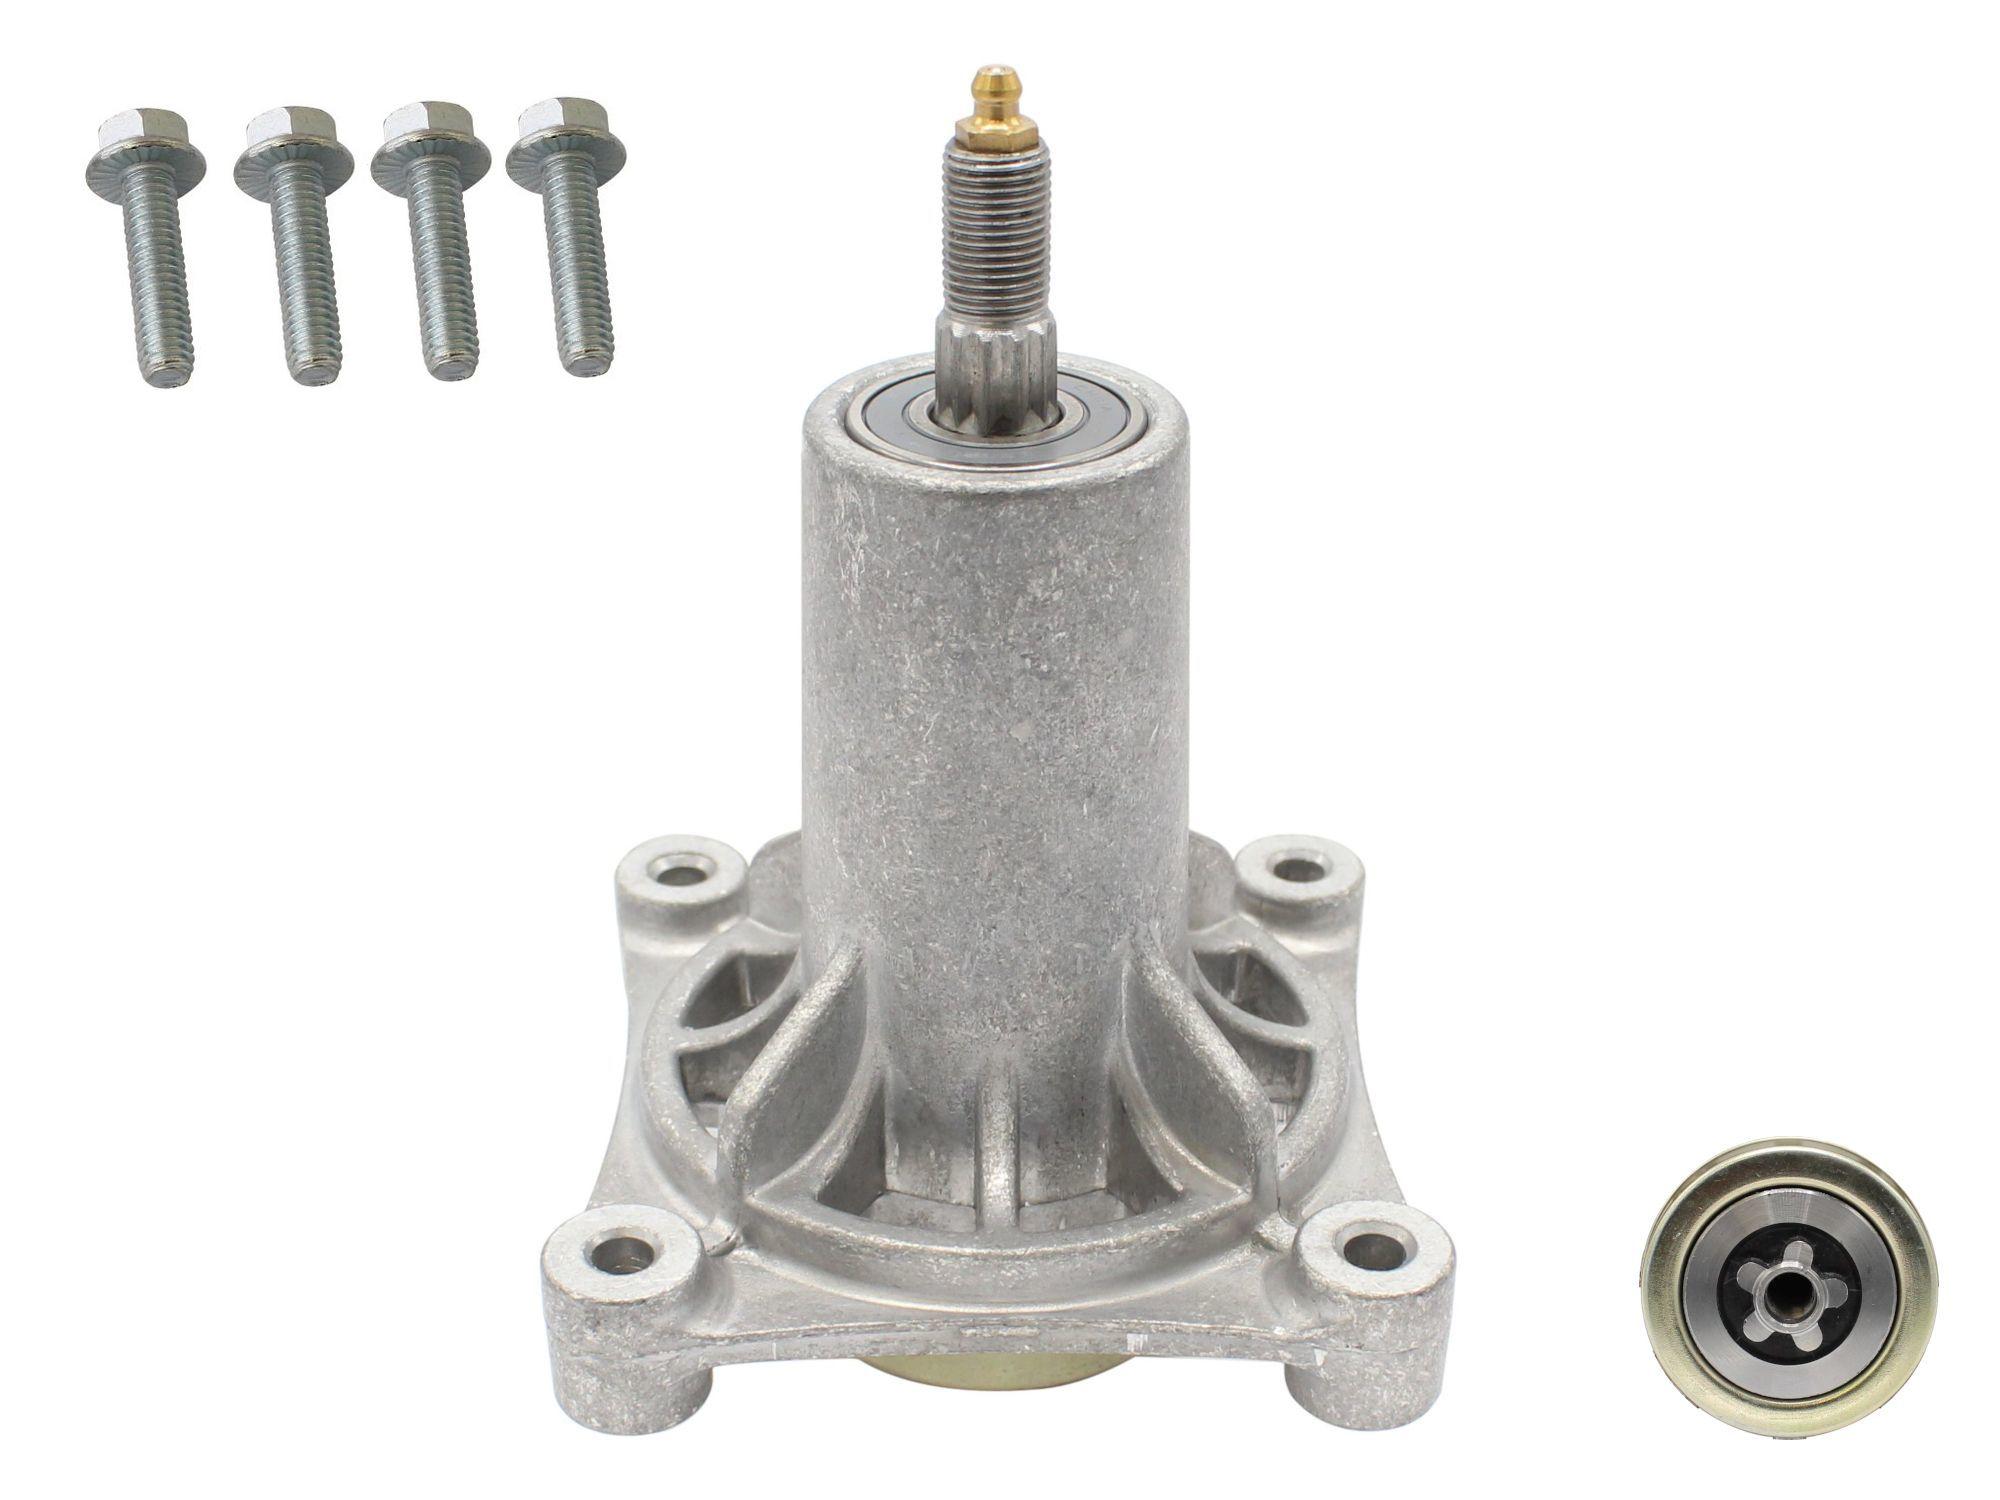 Mulch-Kombi Messer-Set passend Husqvarna CTH164T 96051003100 Rasentraktor